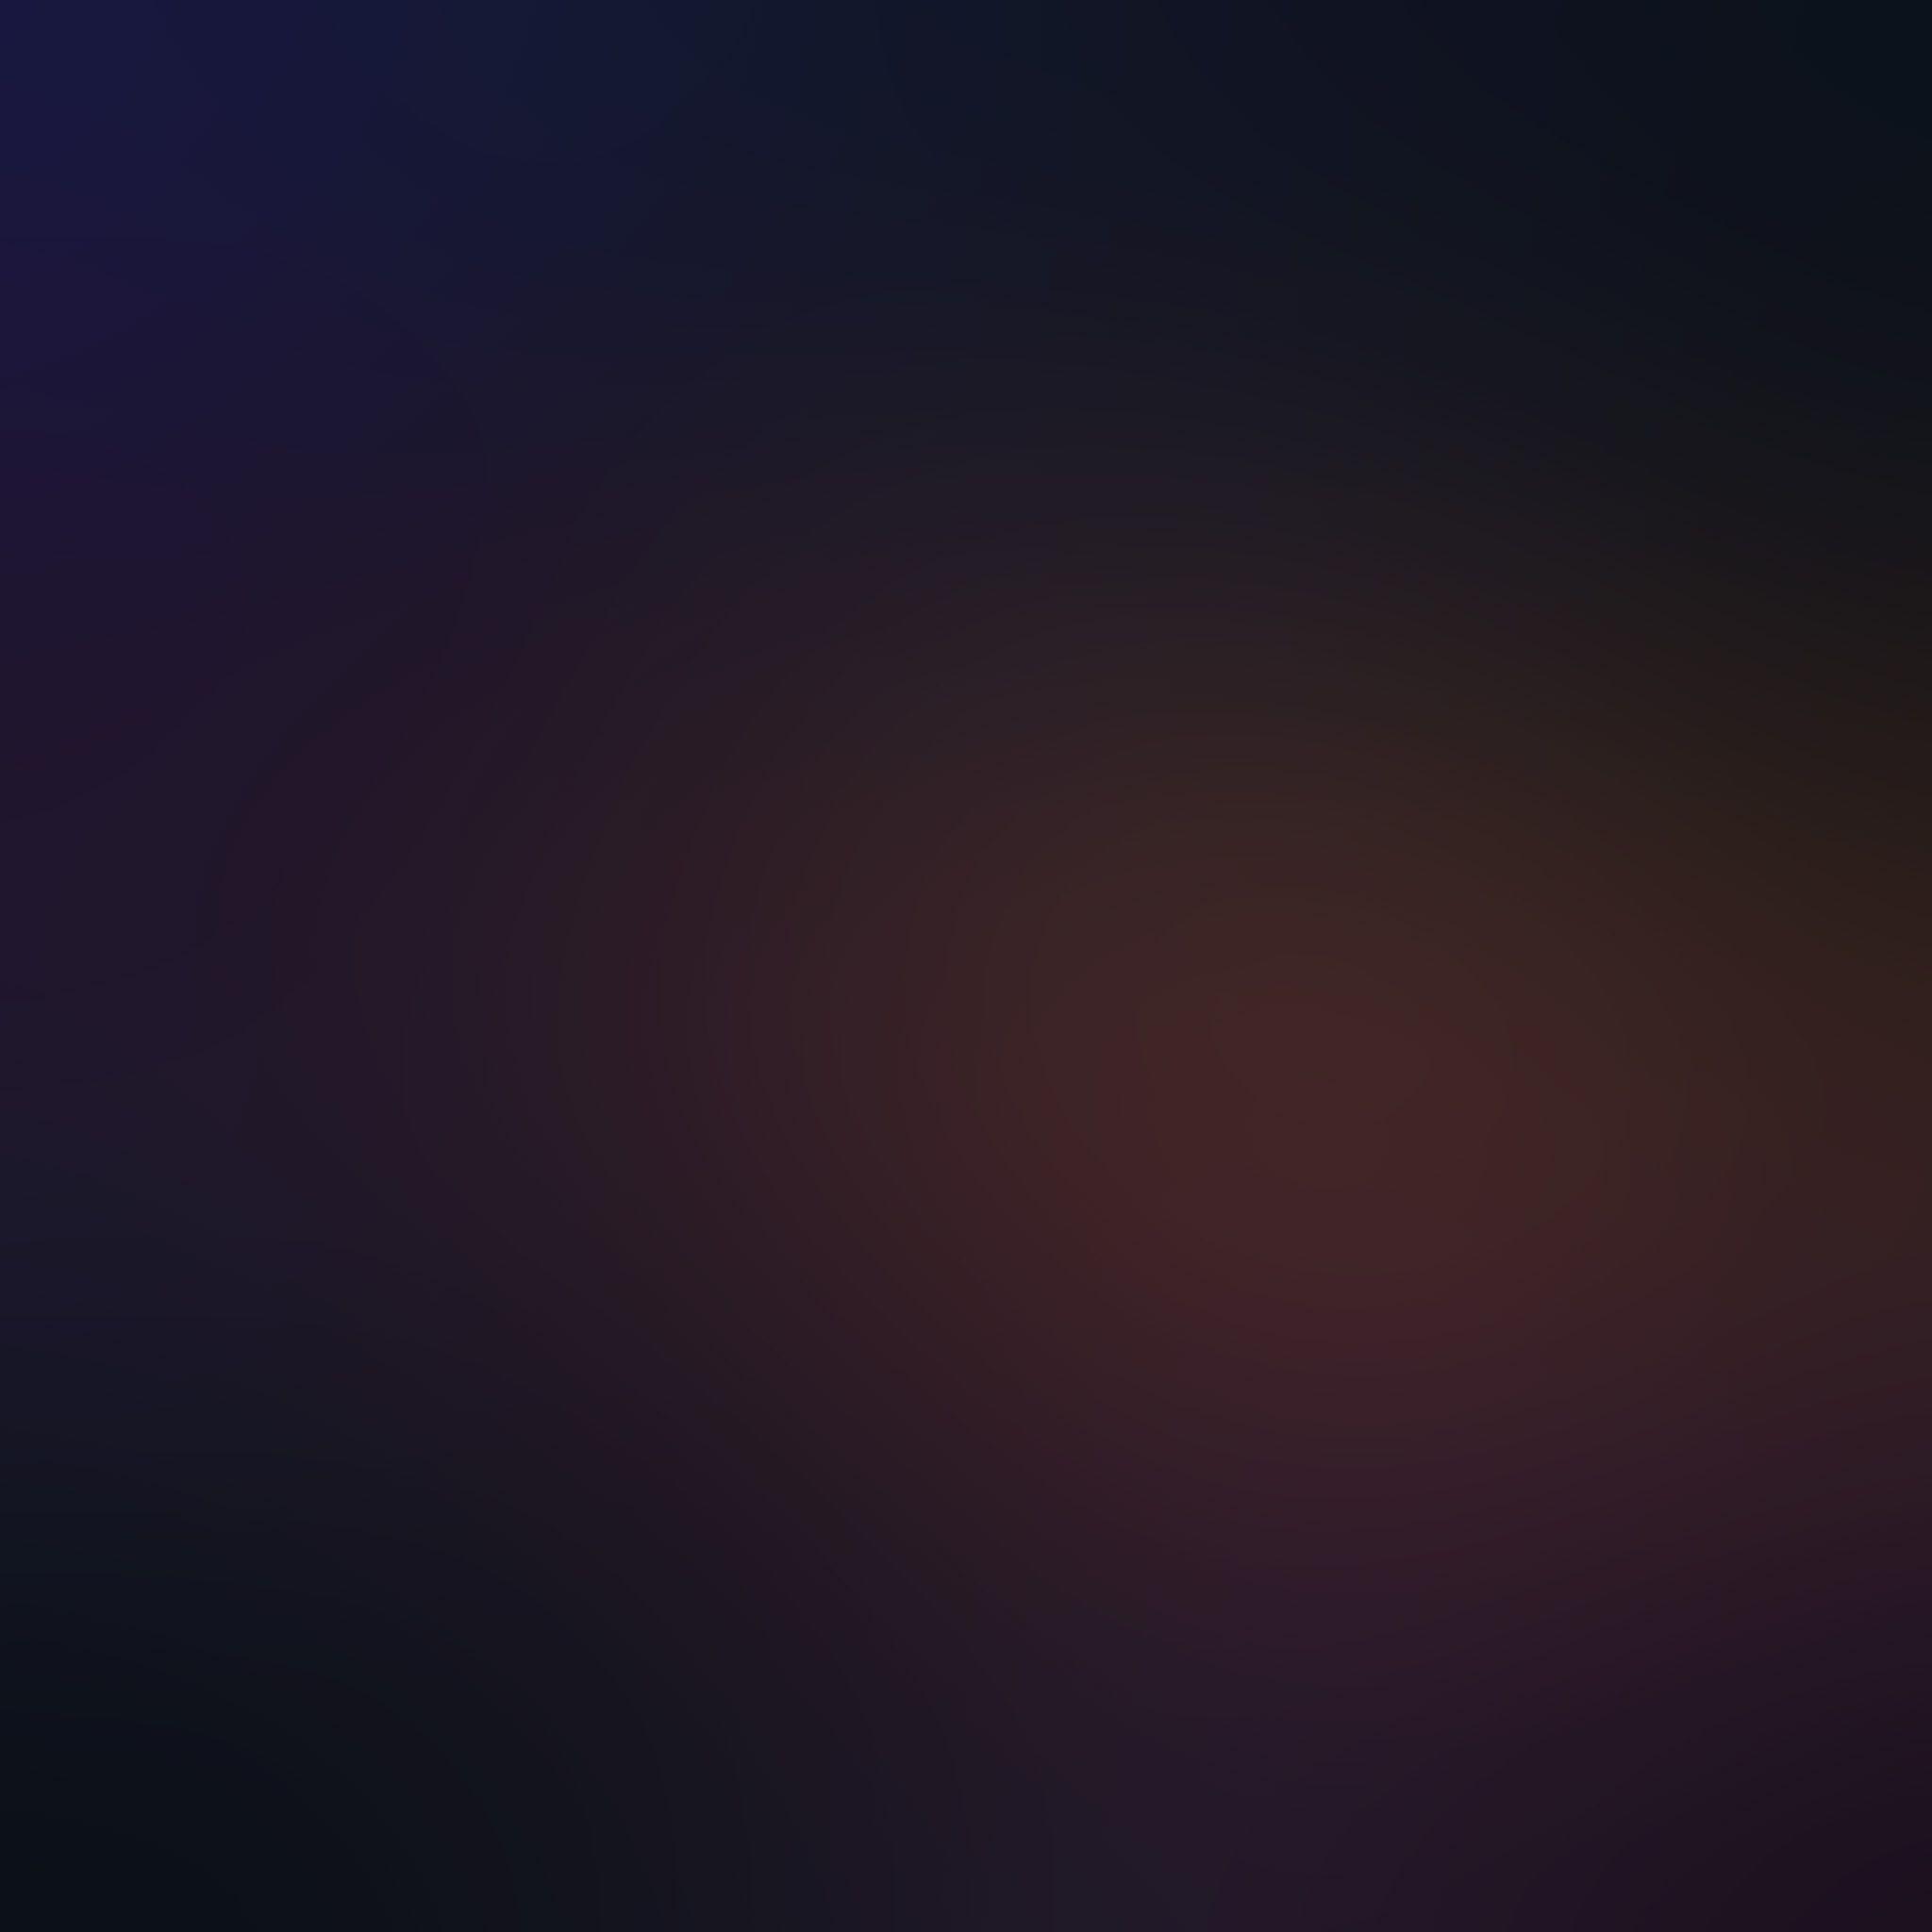 Dark Color Inside Gradation Blur iPad Air Wallpaper Download .